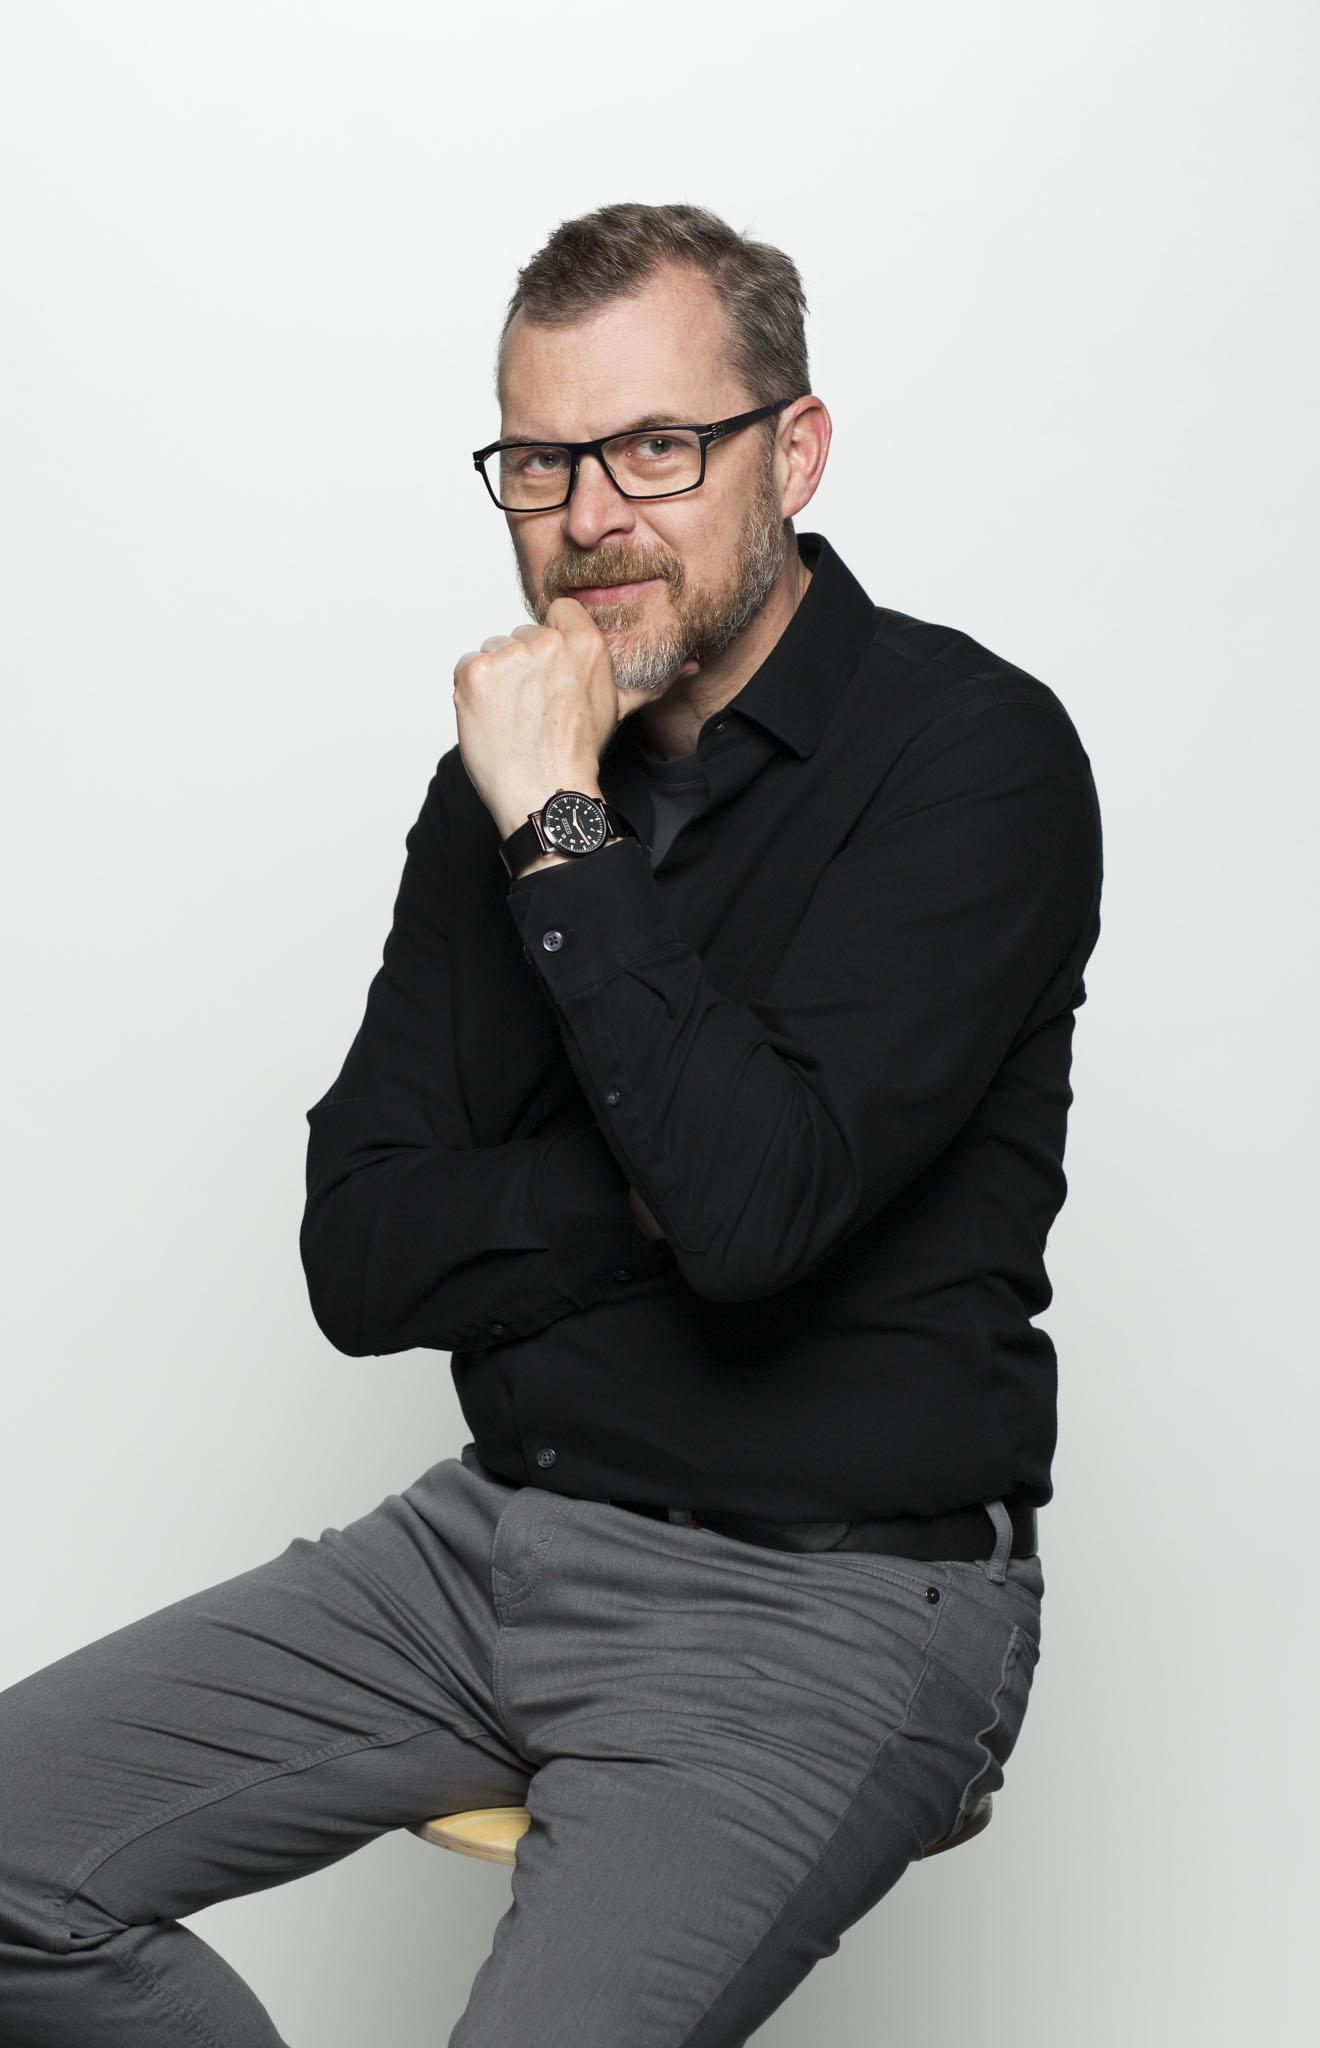 Jon Kowing